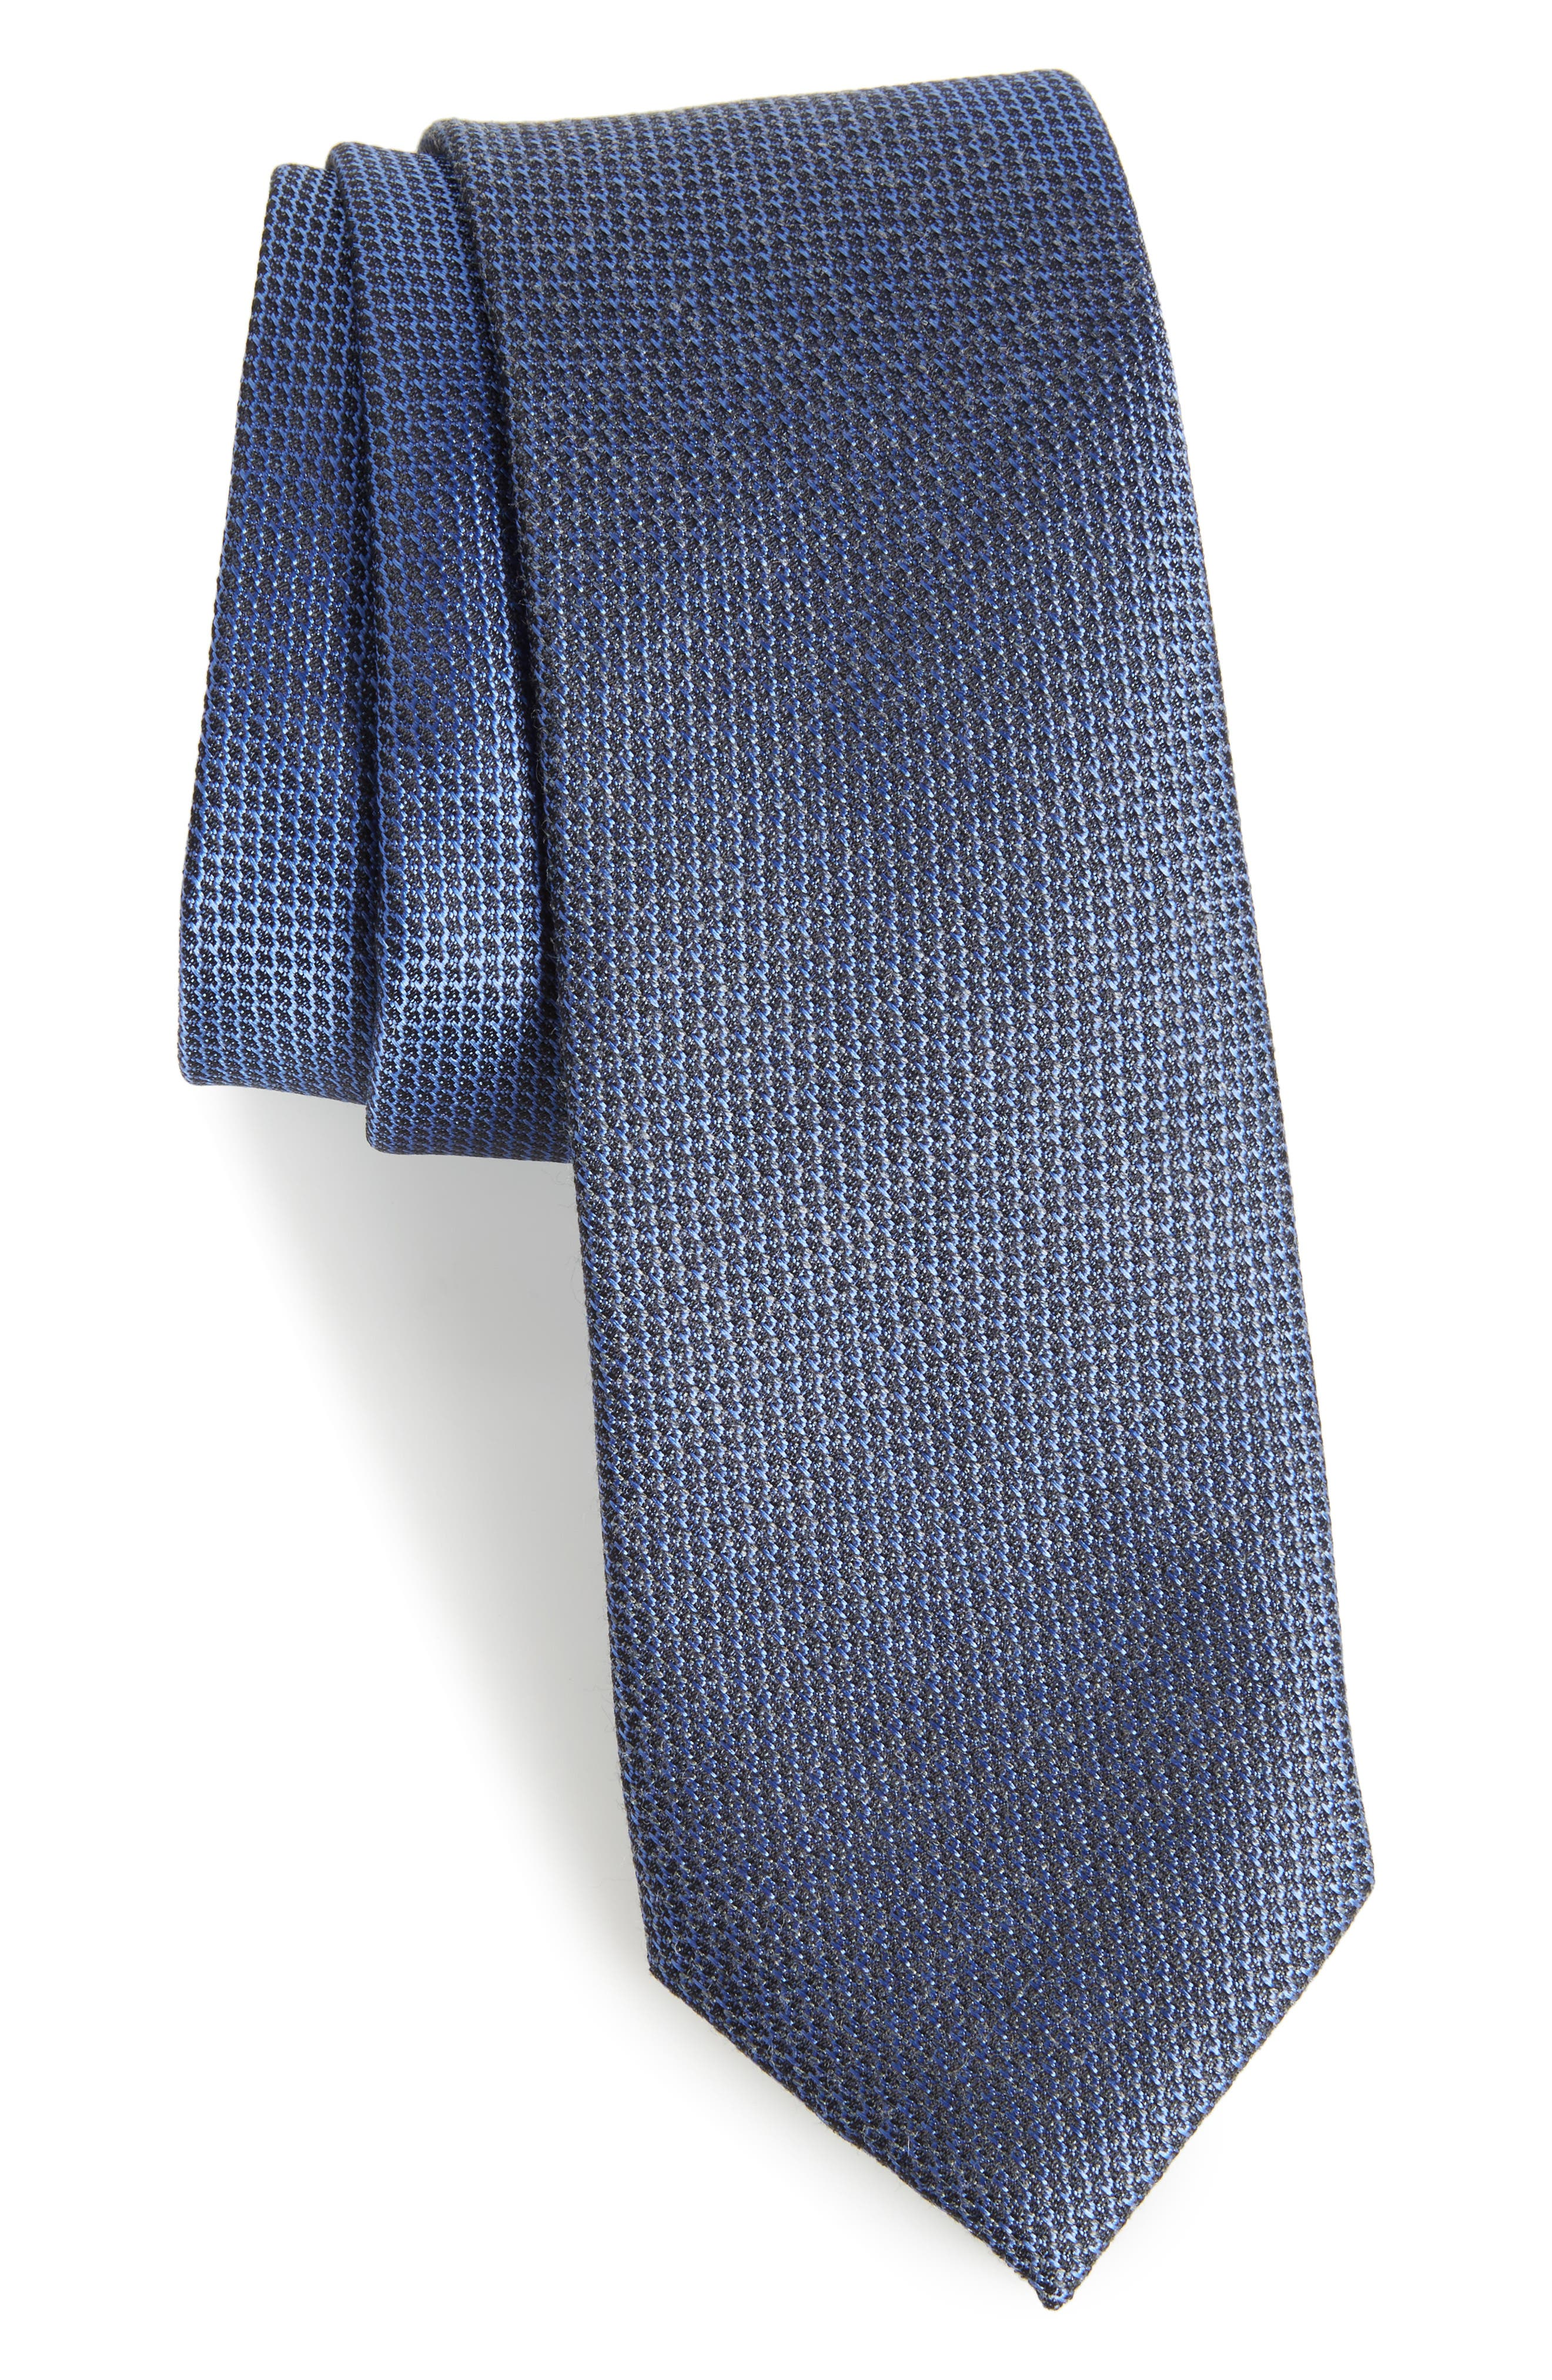 Calibrate Kenton Textured Silk Blend Skinny Tie